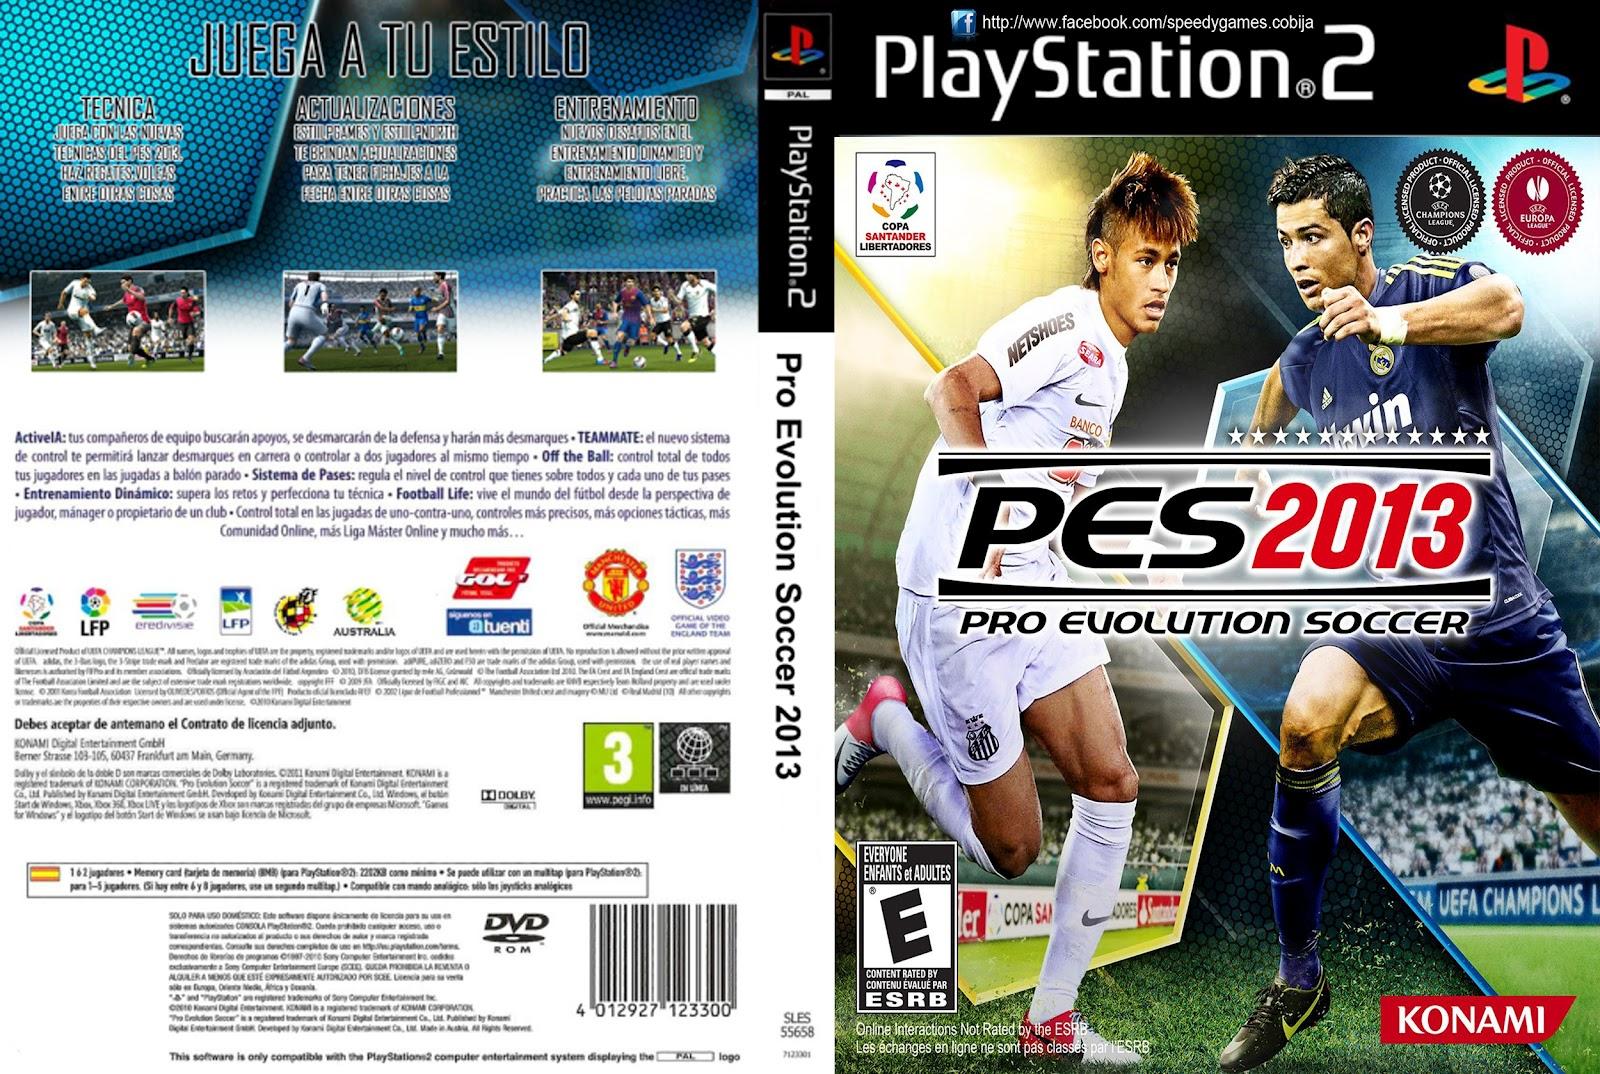 Pro evolution soccer 2013 (free) download latest version in.